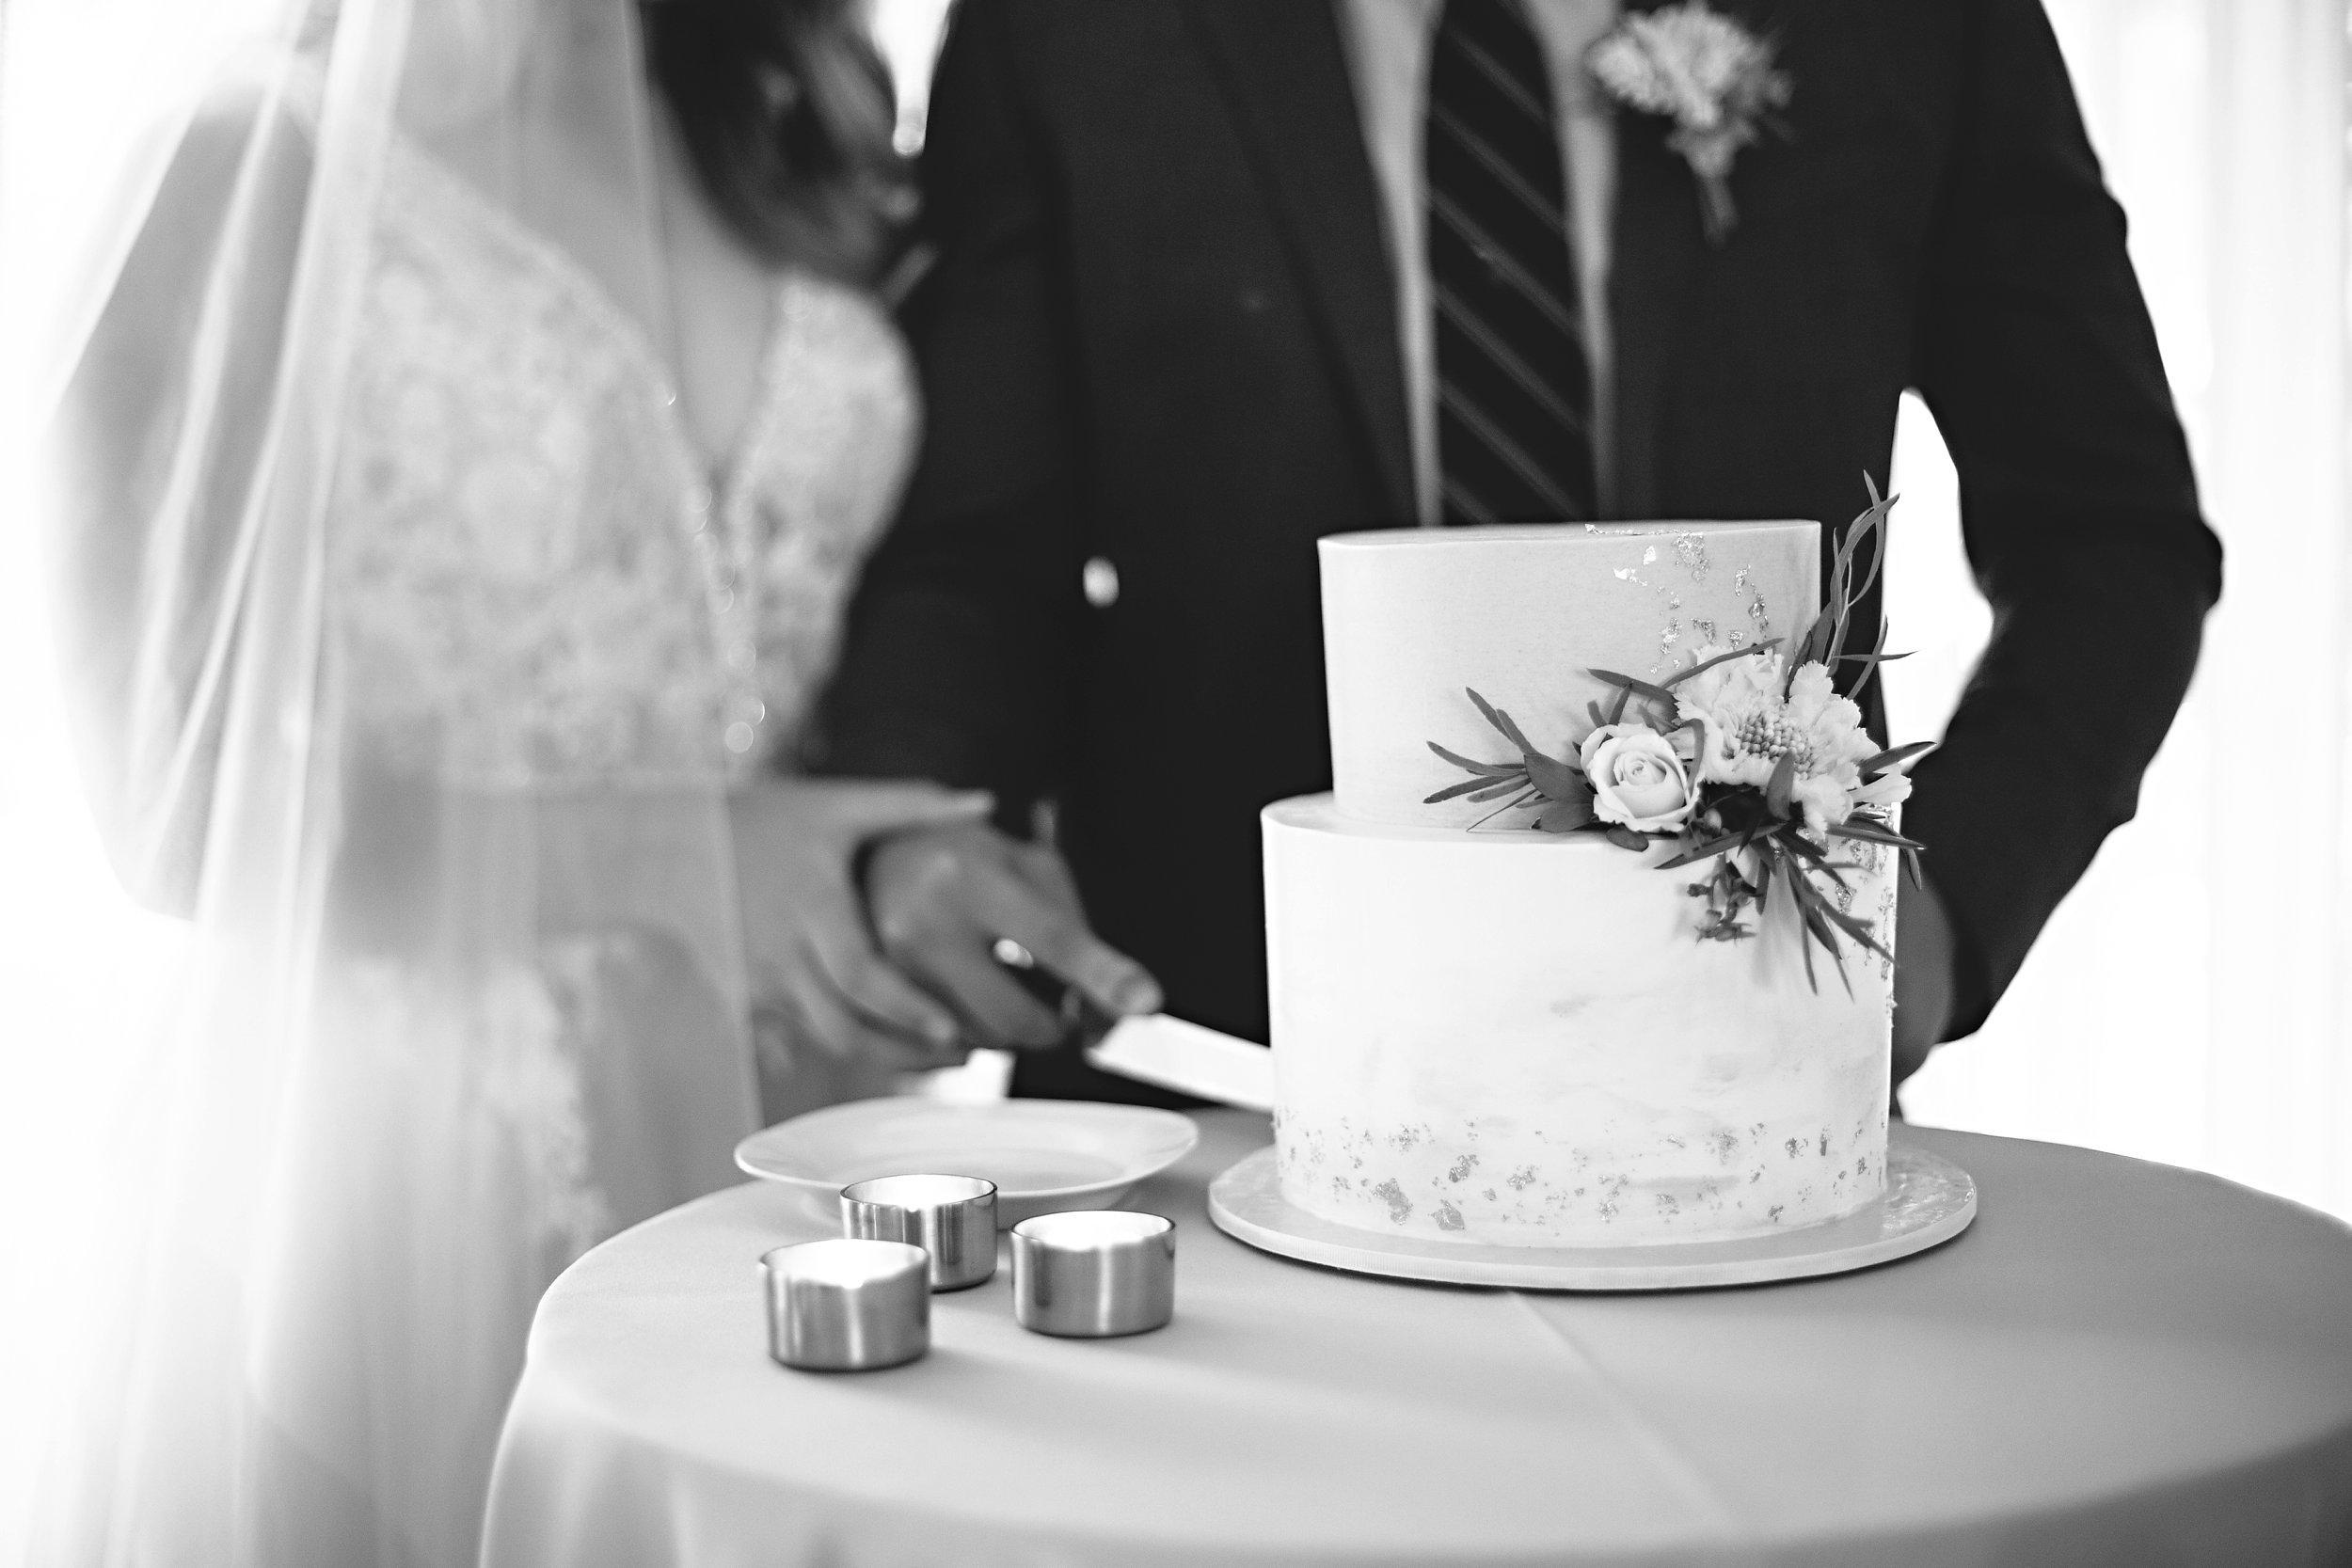 Copy of Summer Garden Wedding: Cutting of the cake